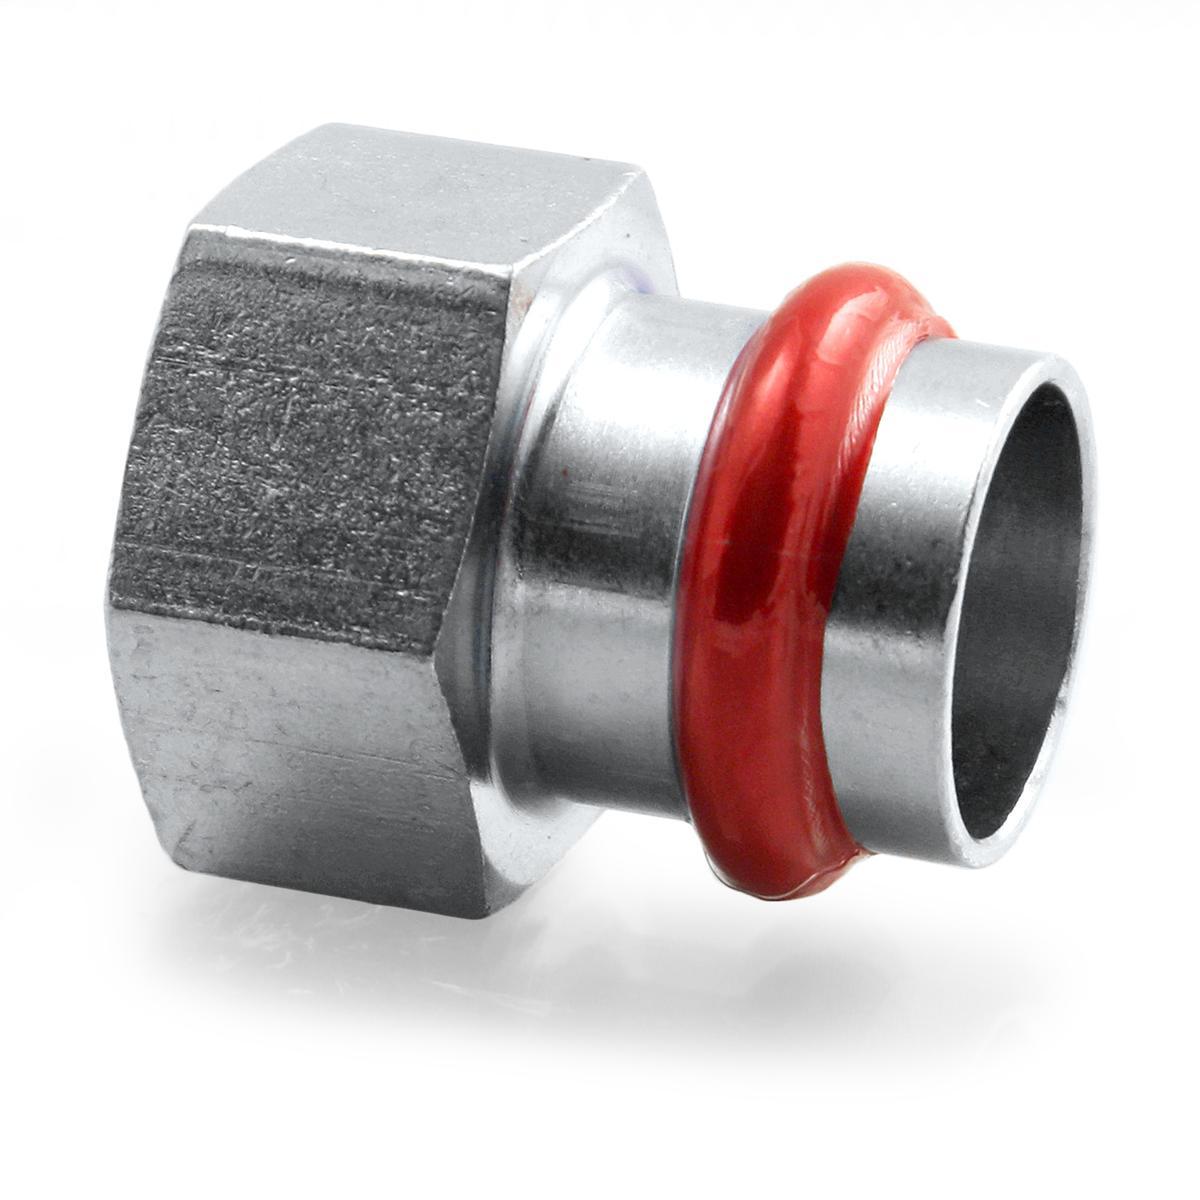 Press Steel Straight Female 1/2Fx18